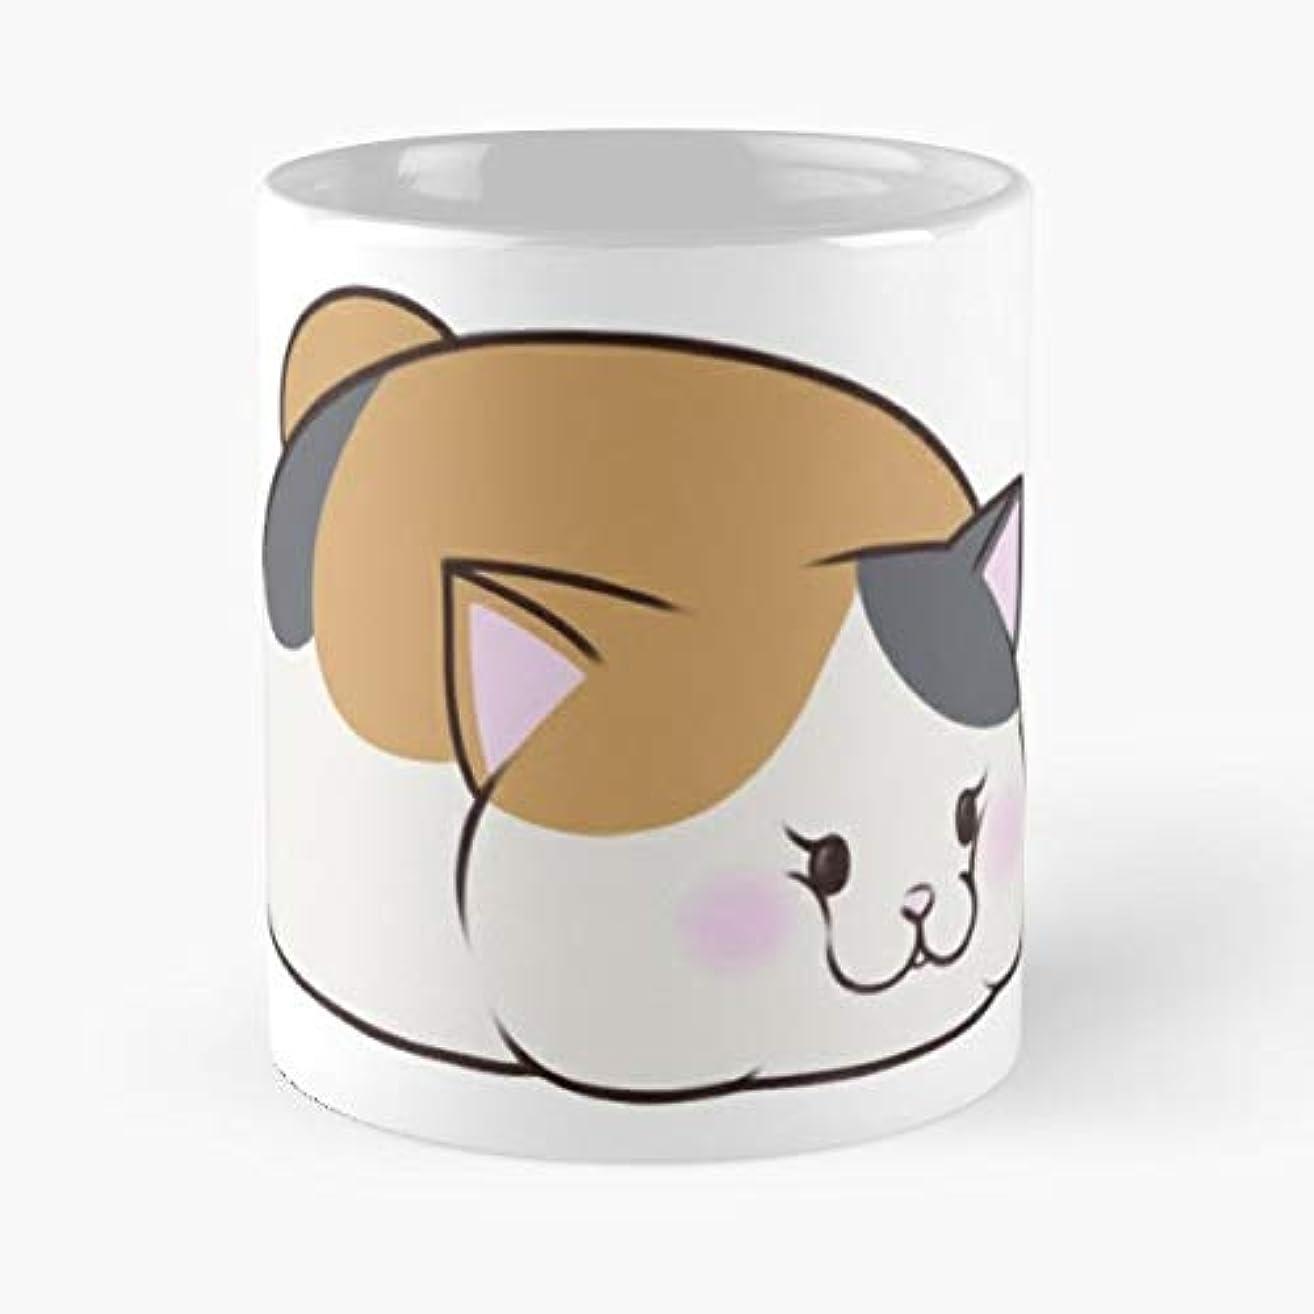 Ffxiv Ff14 Final Fantasy Xiv - Morning Coffee Mug Ceramic Best Gift